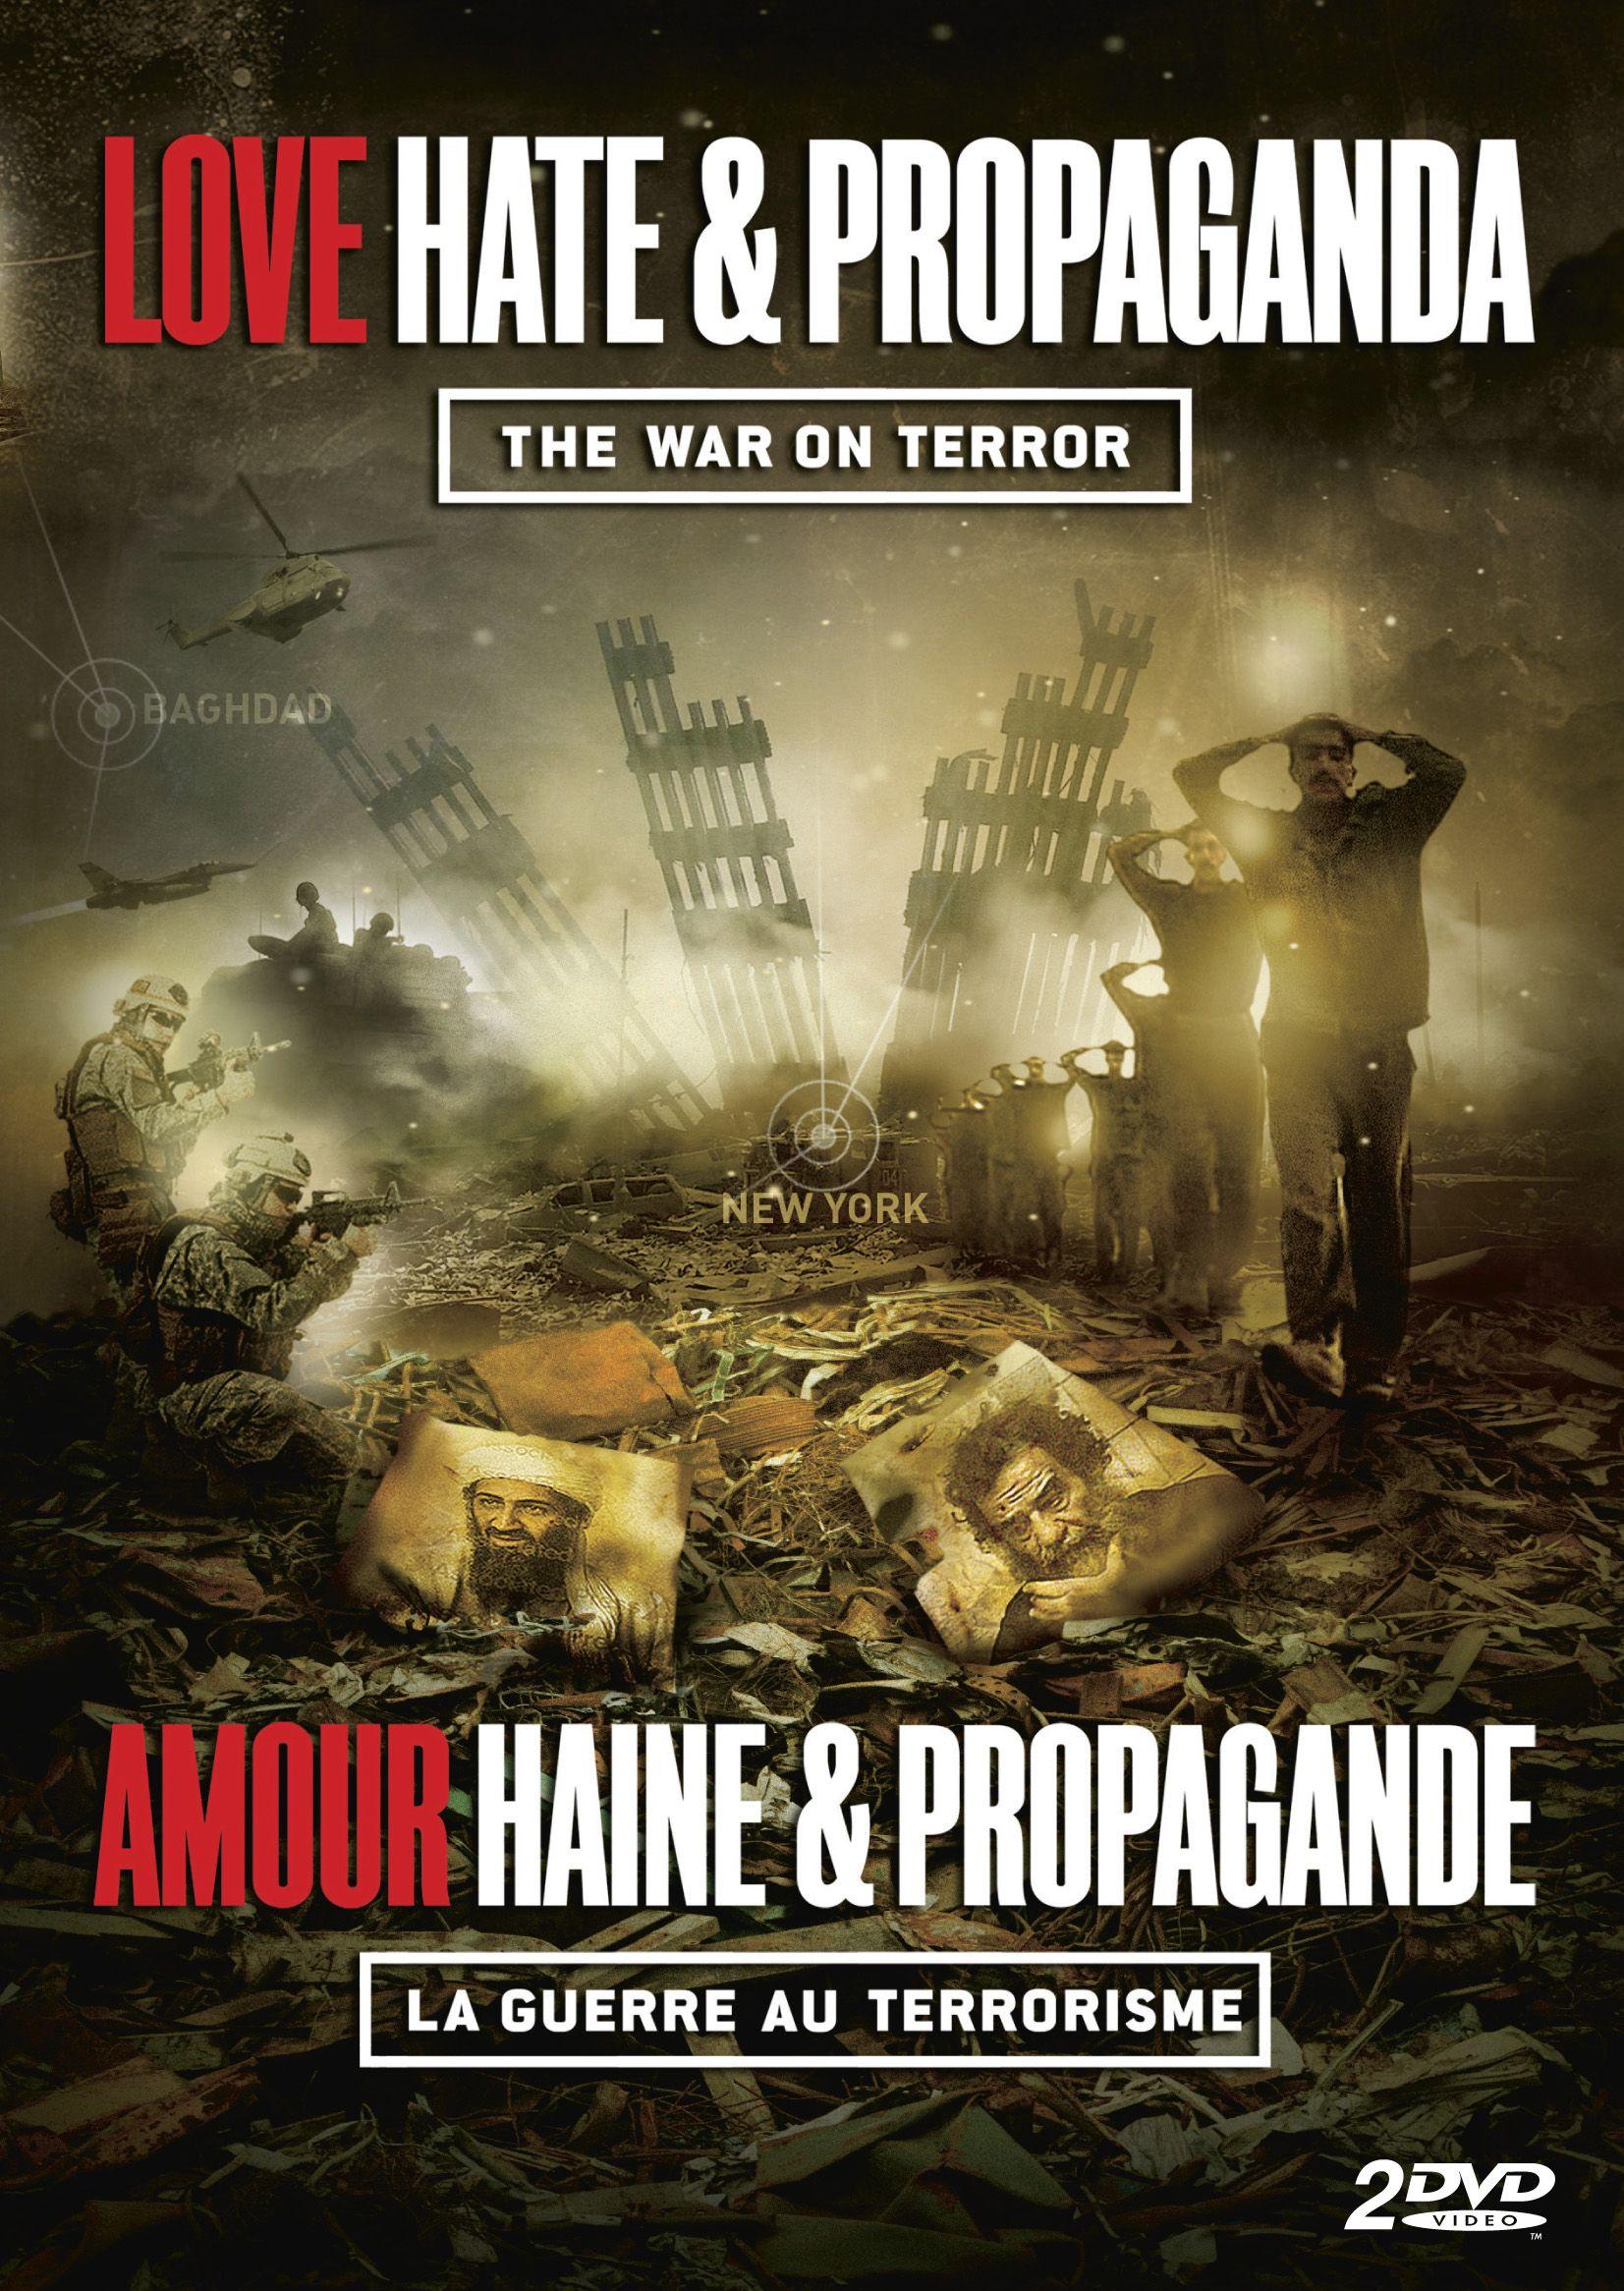 Love, Hate and Propaganda: The War on Terror